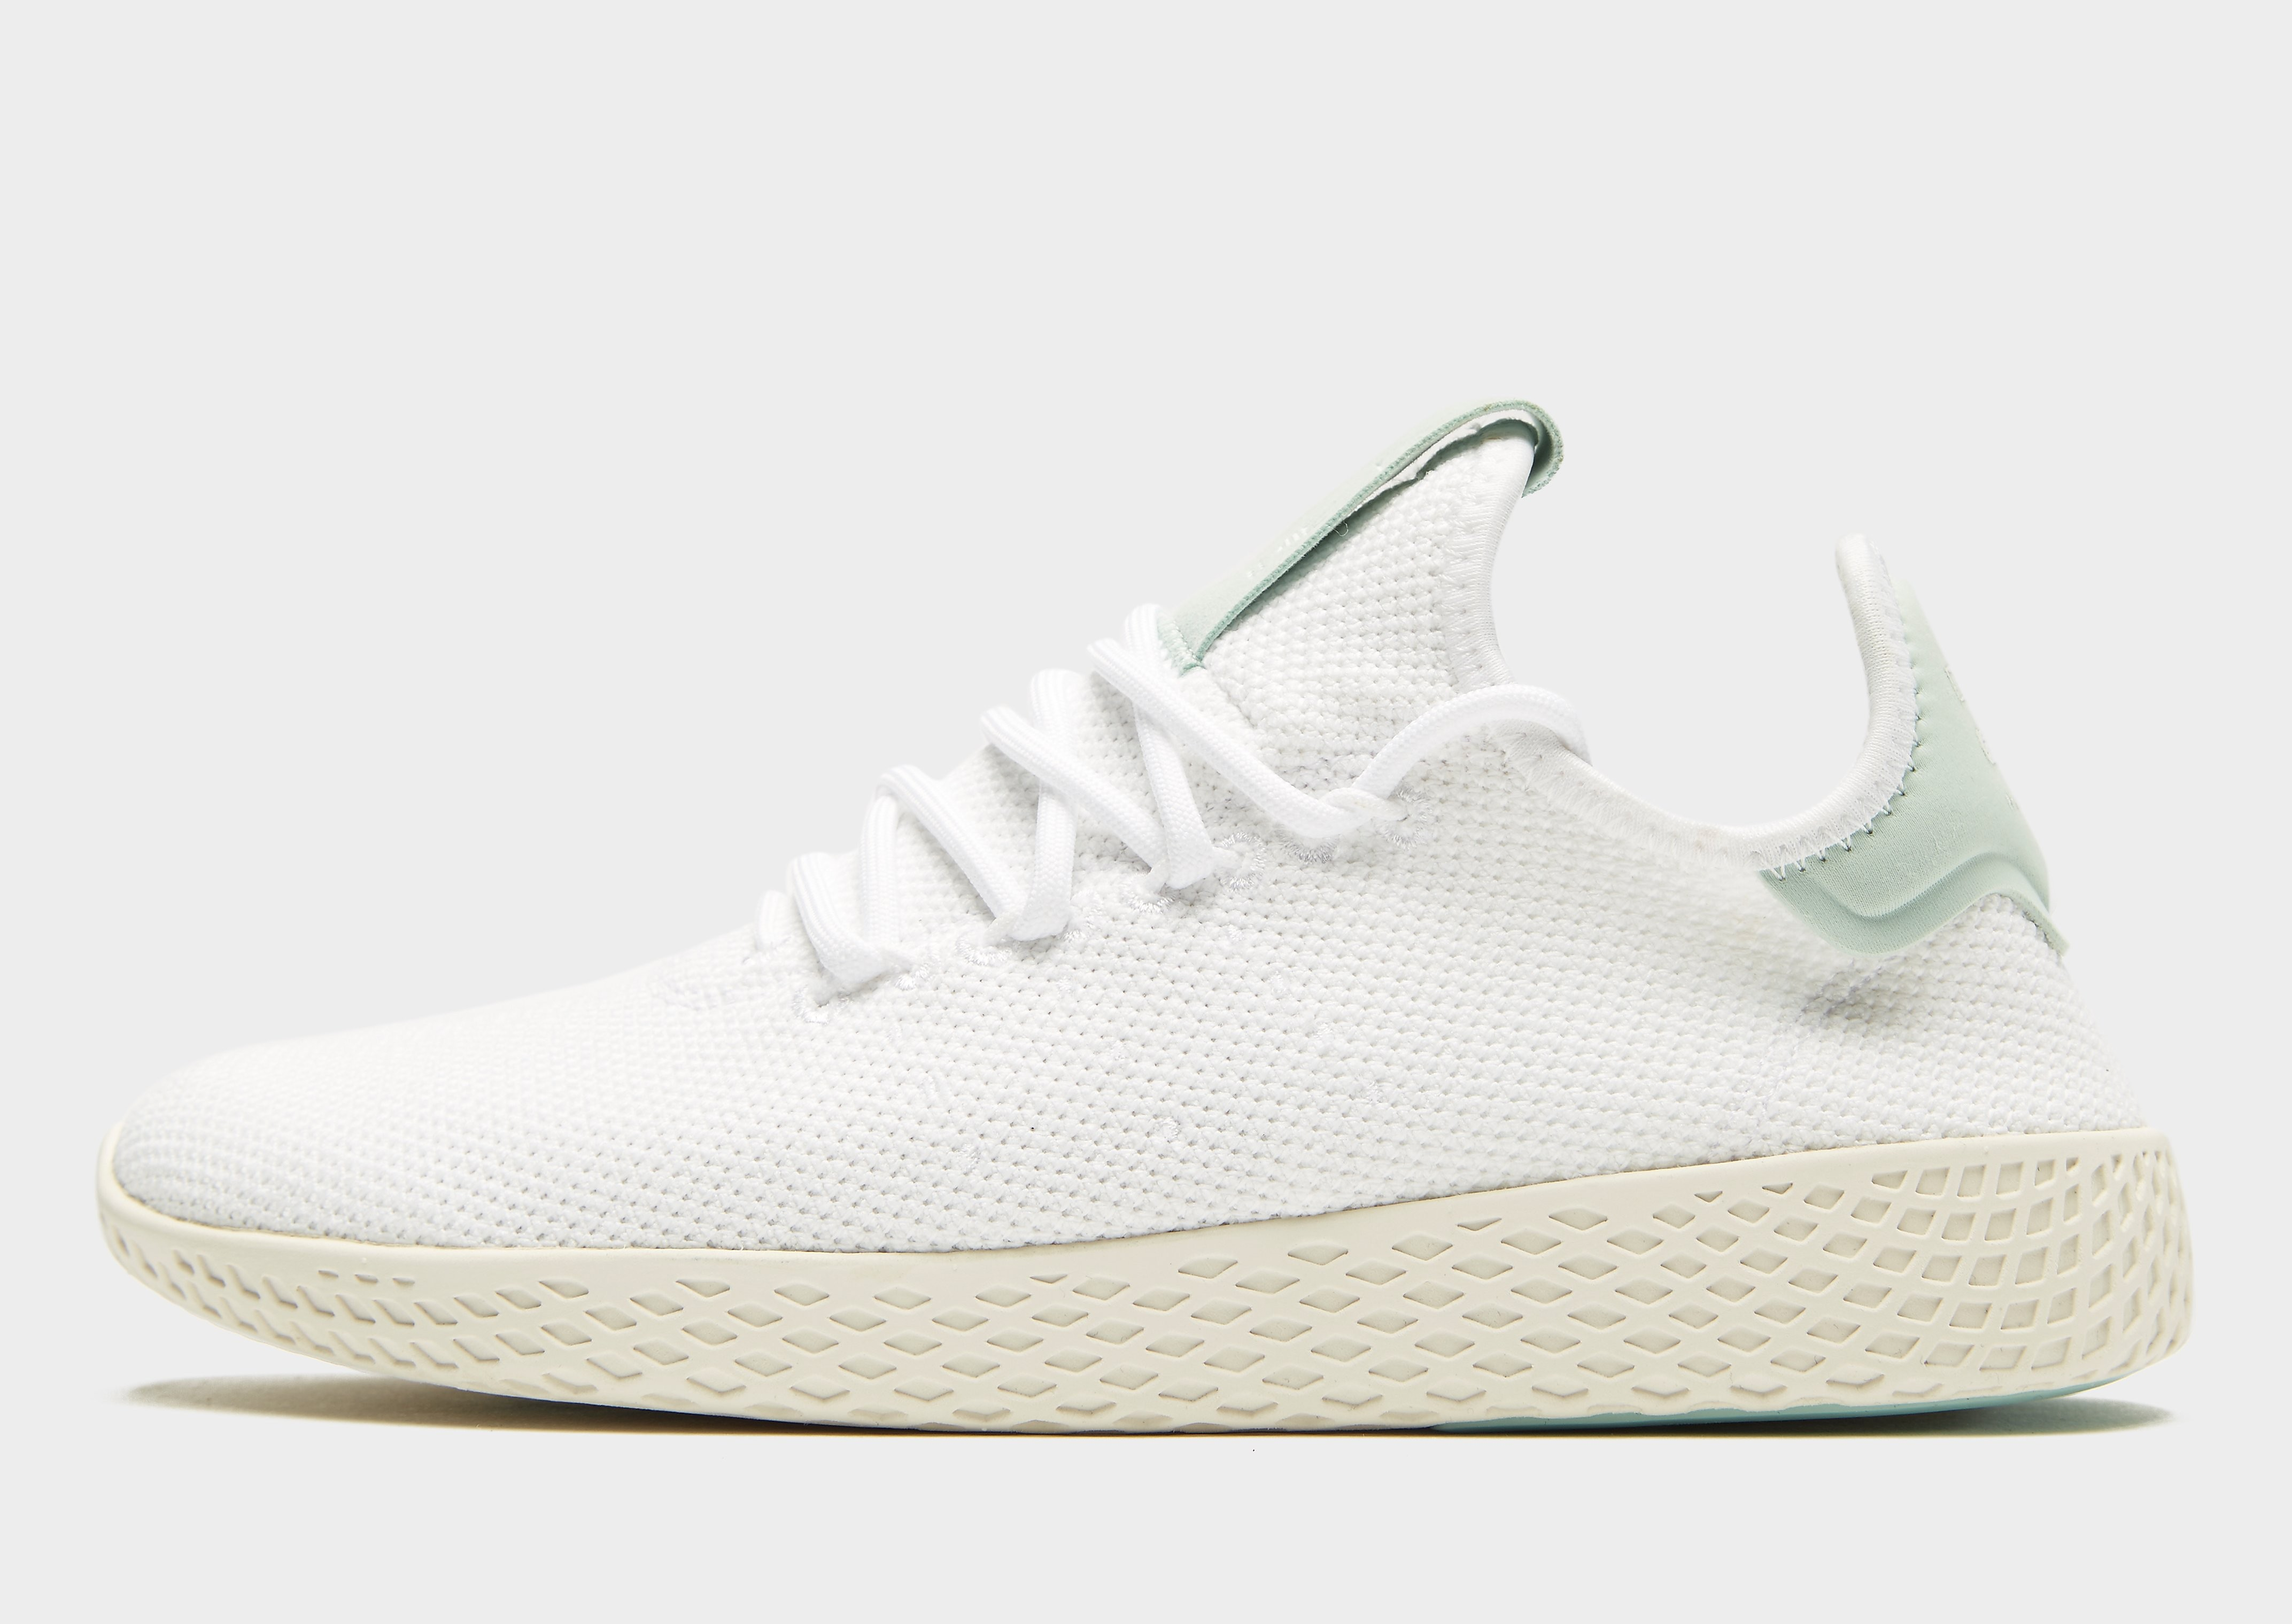 adidas Originals x Pharrell Williams Tennis Hu Women's